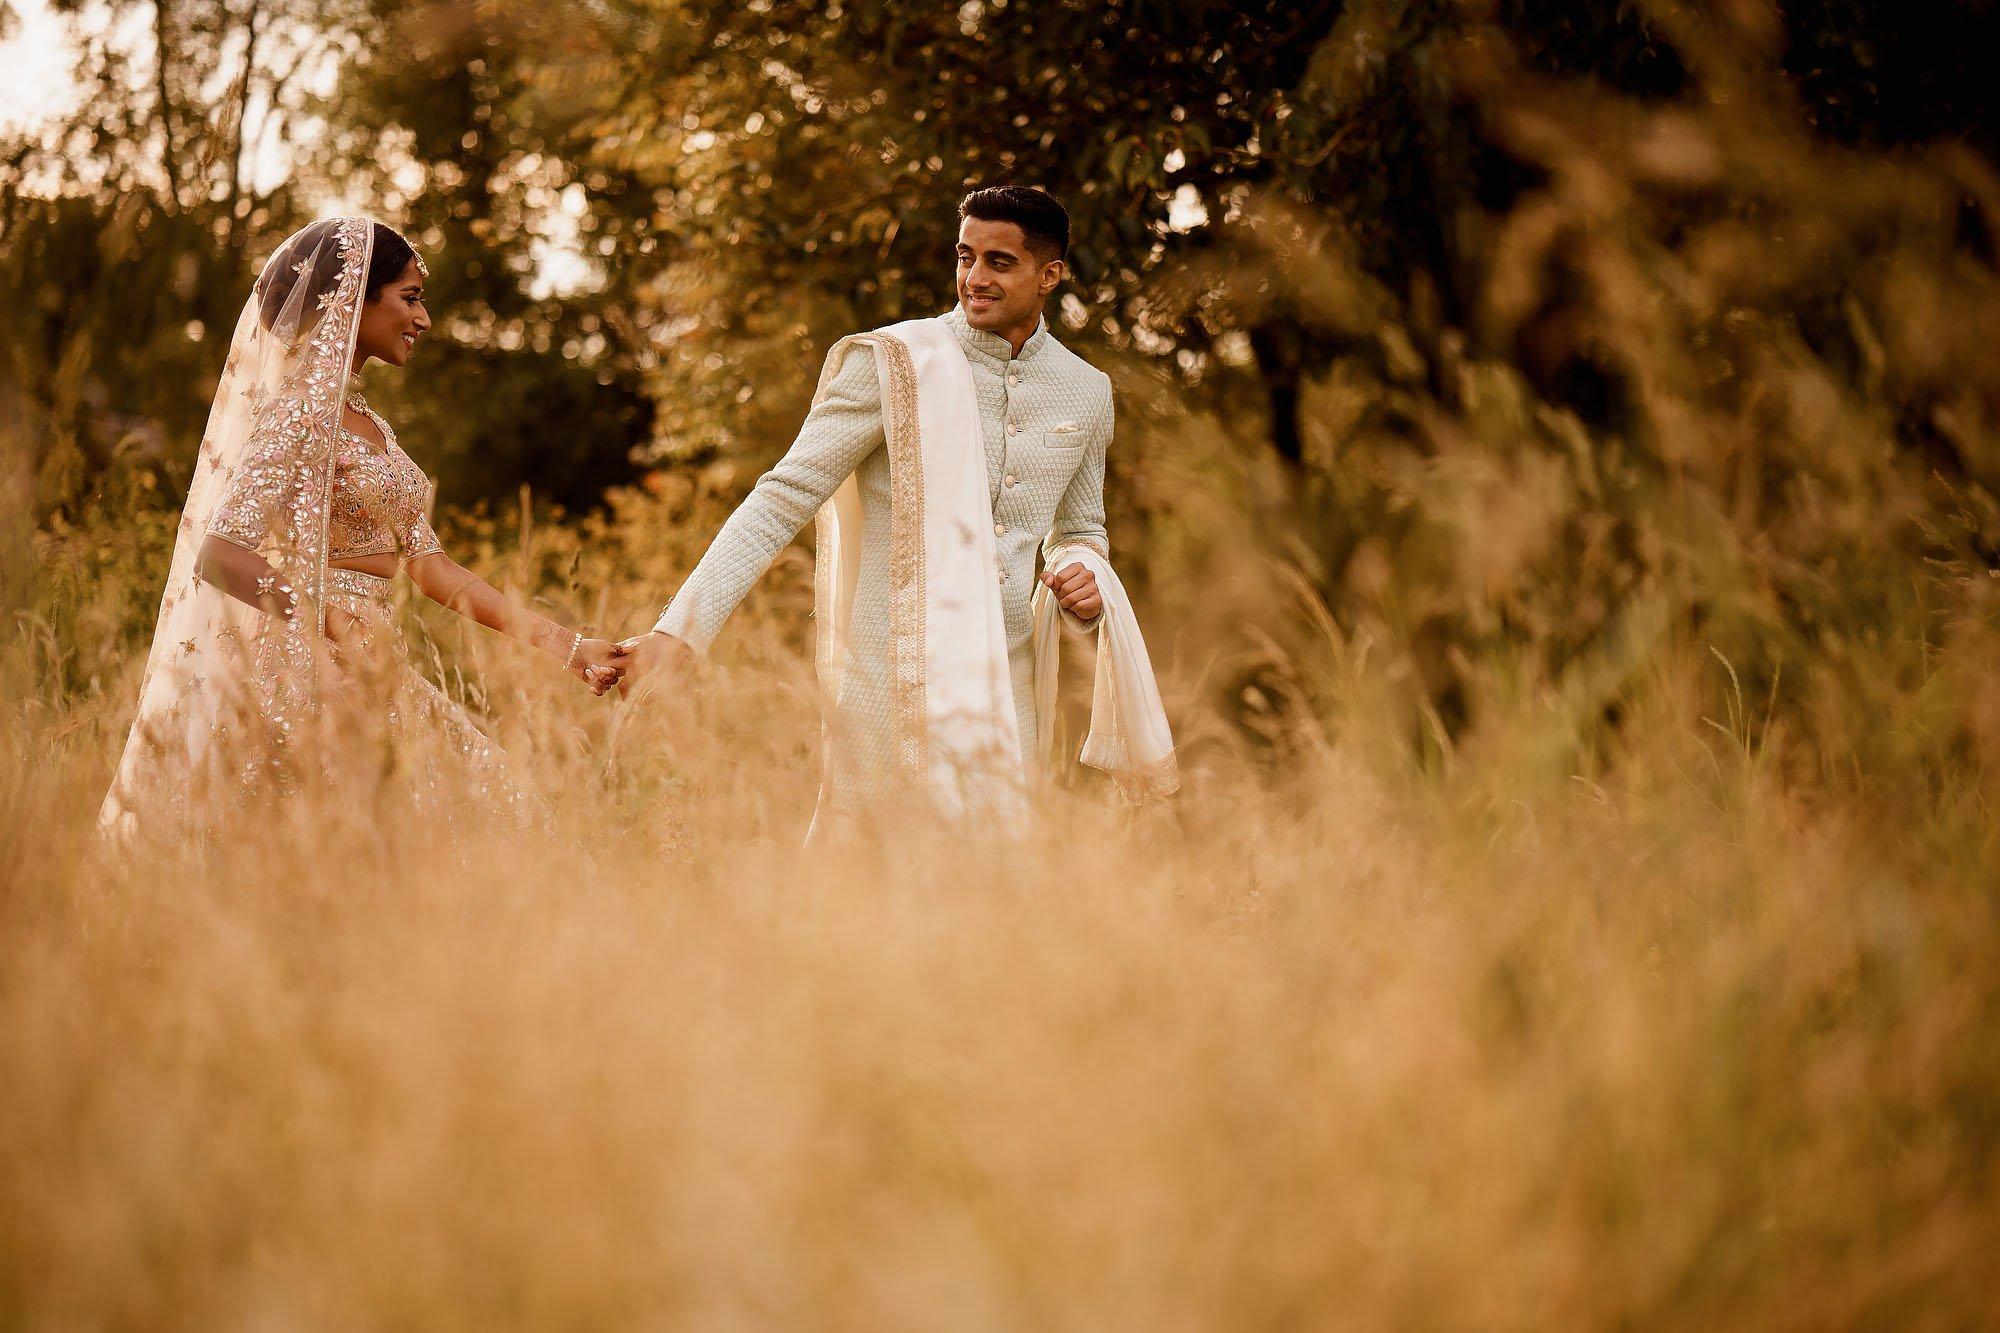 Beautiful offley place indian wedding photography